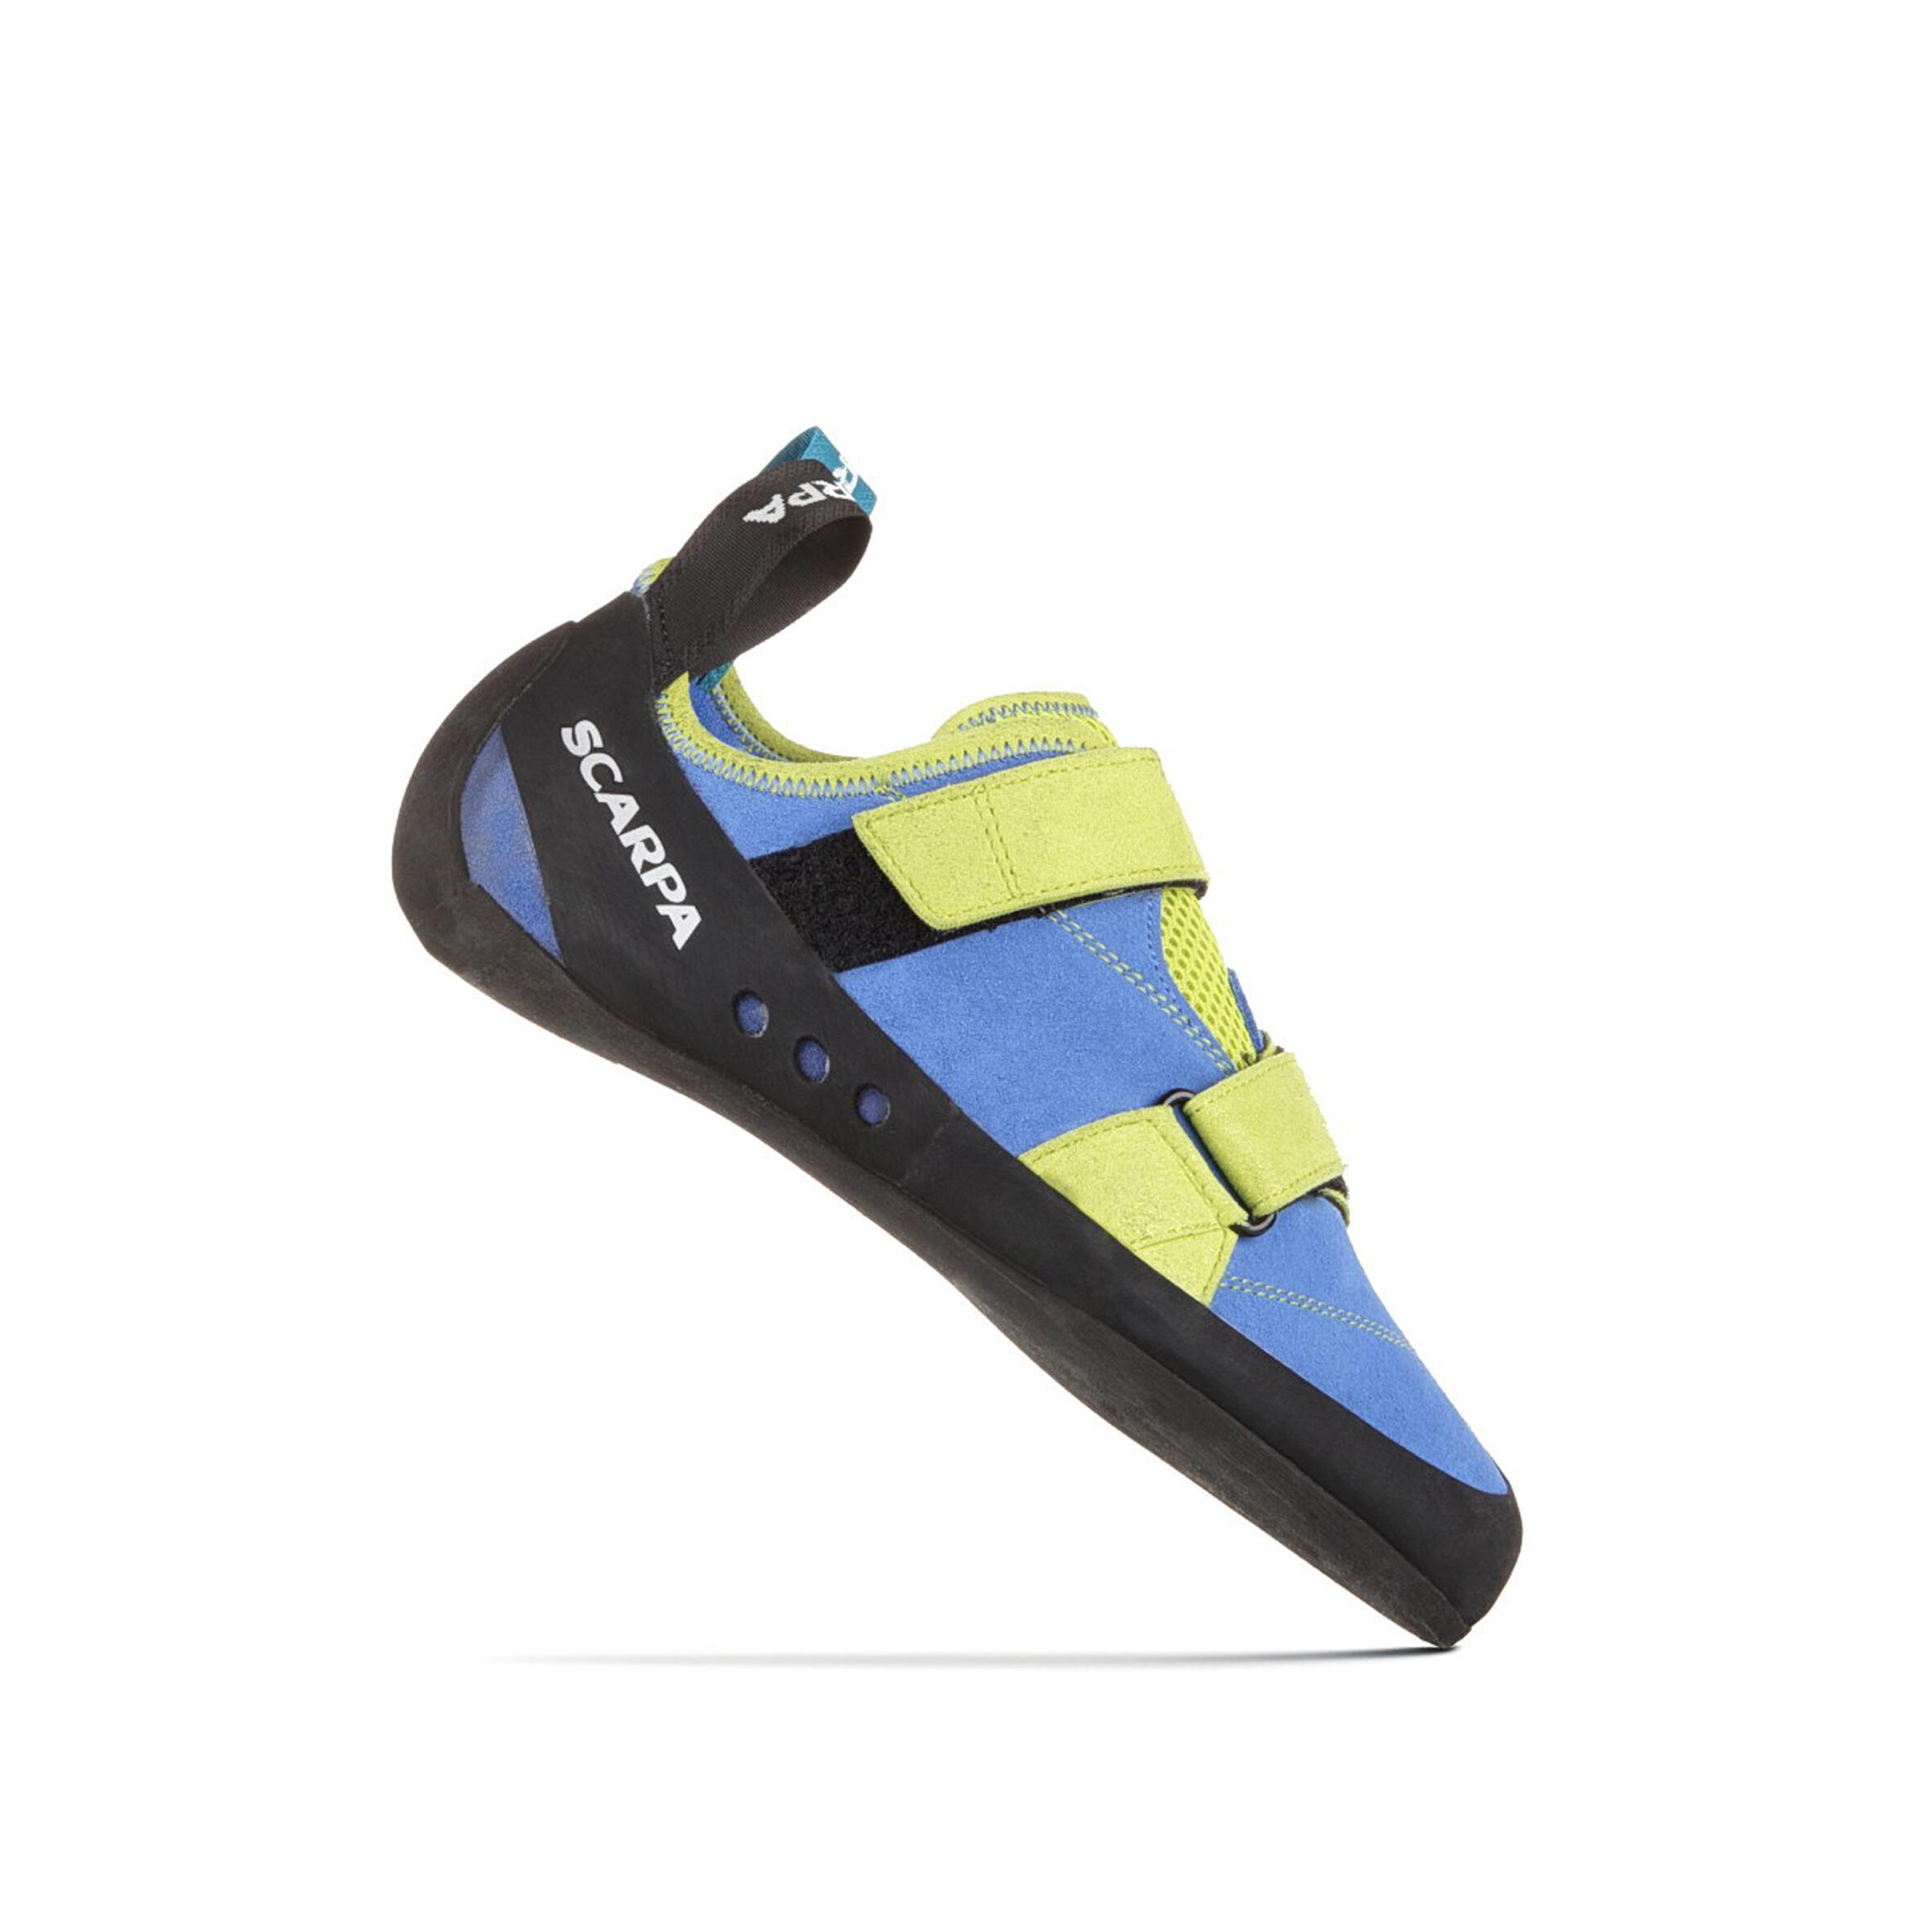 Kletterschuhe Prime Erwachsene | Schuhe > Outdoorschuhe > Kletterschuhe | Gummi | Scarpa